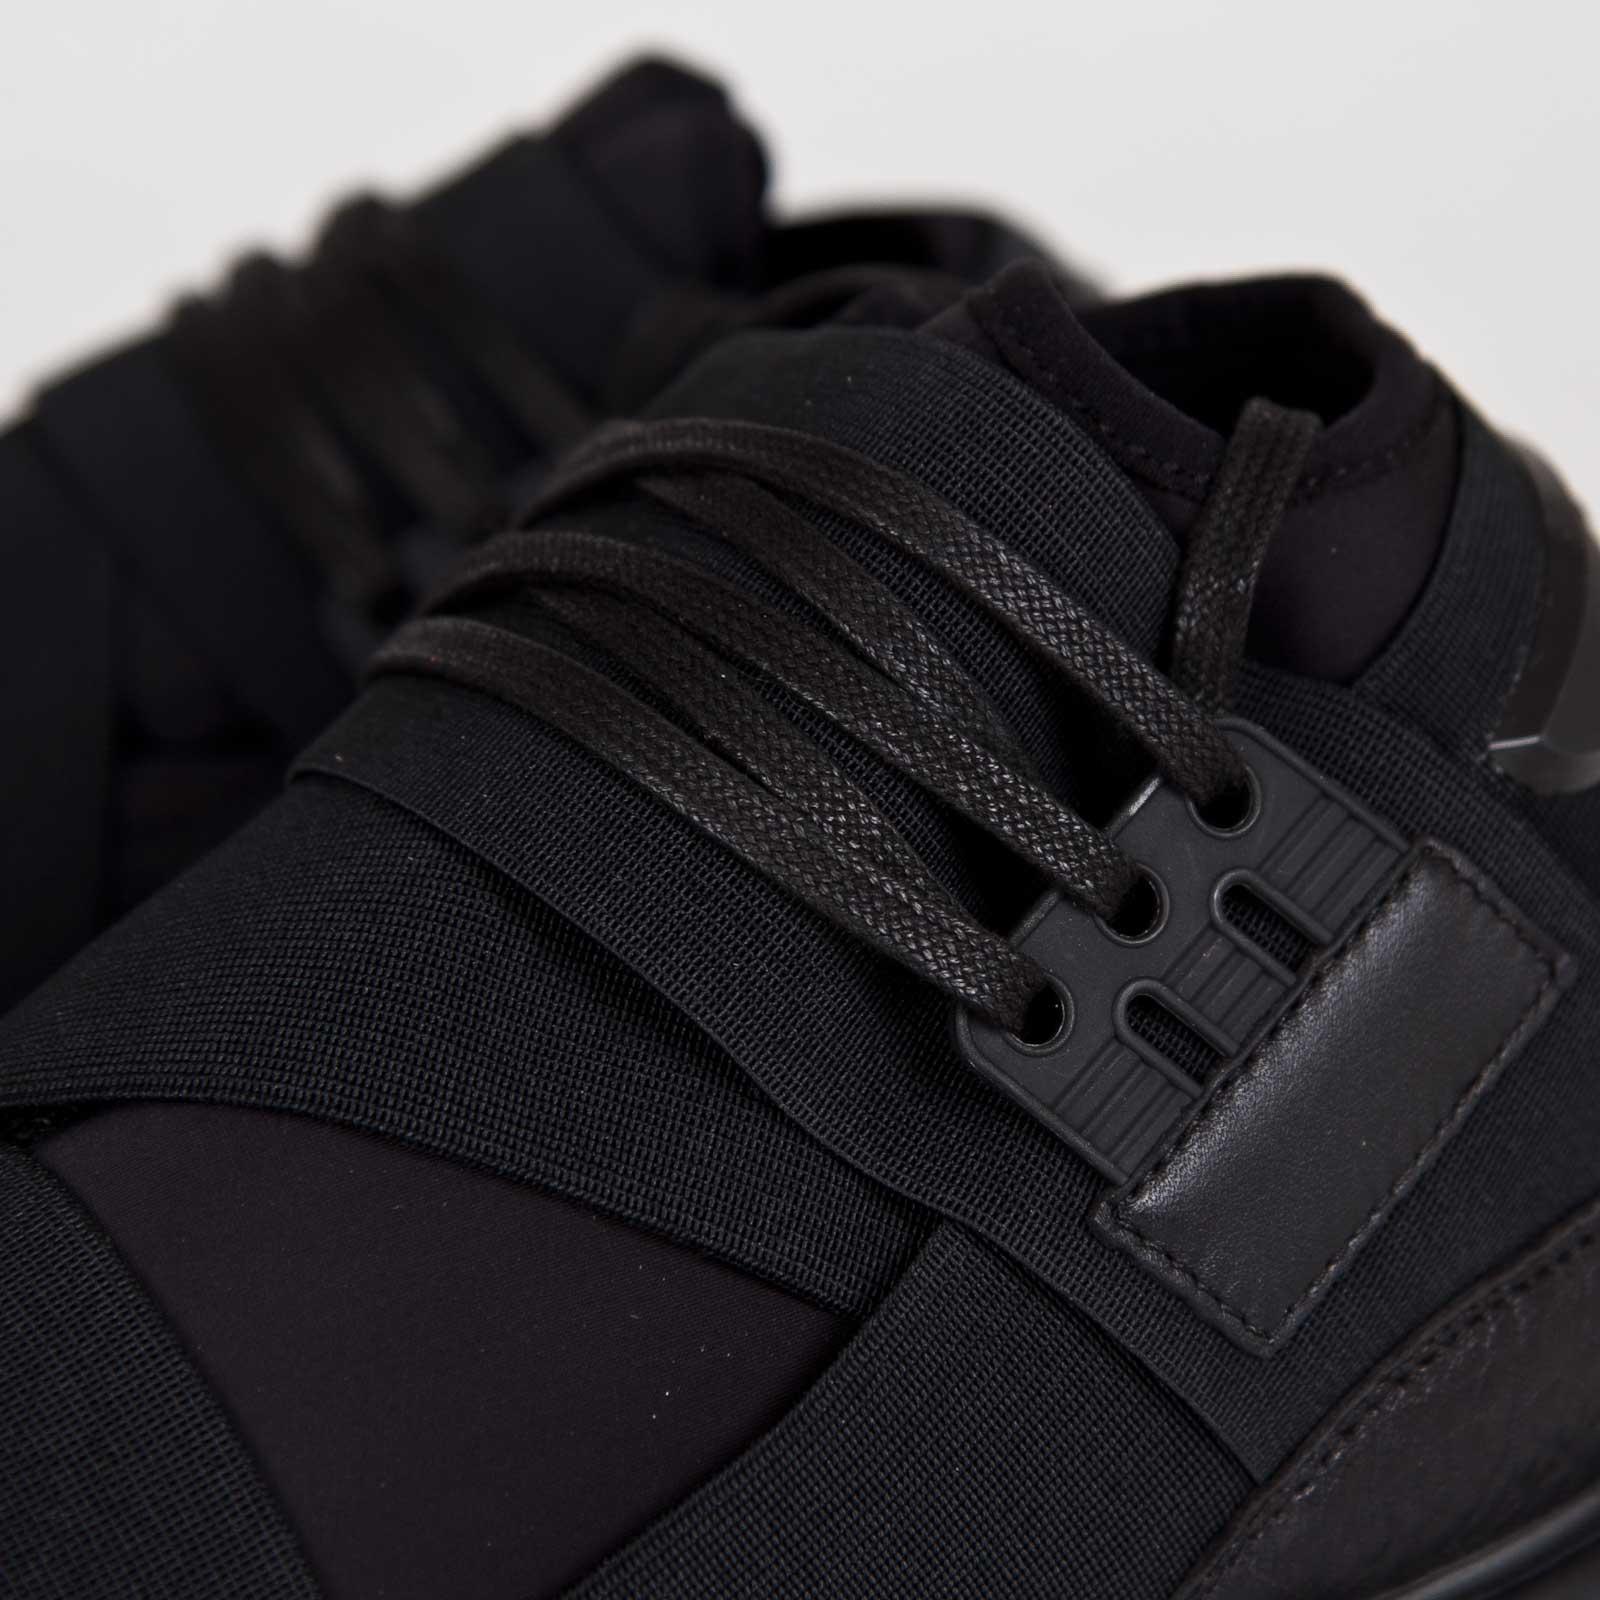 buy online b3dd0 08aff adidas Y-3 Qasa High - M21248 - Sneakersnstuff   sneakers   streetwear  online since 1999